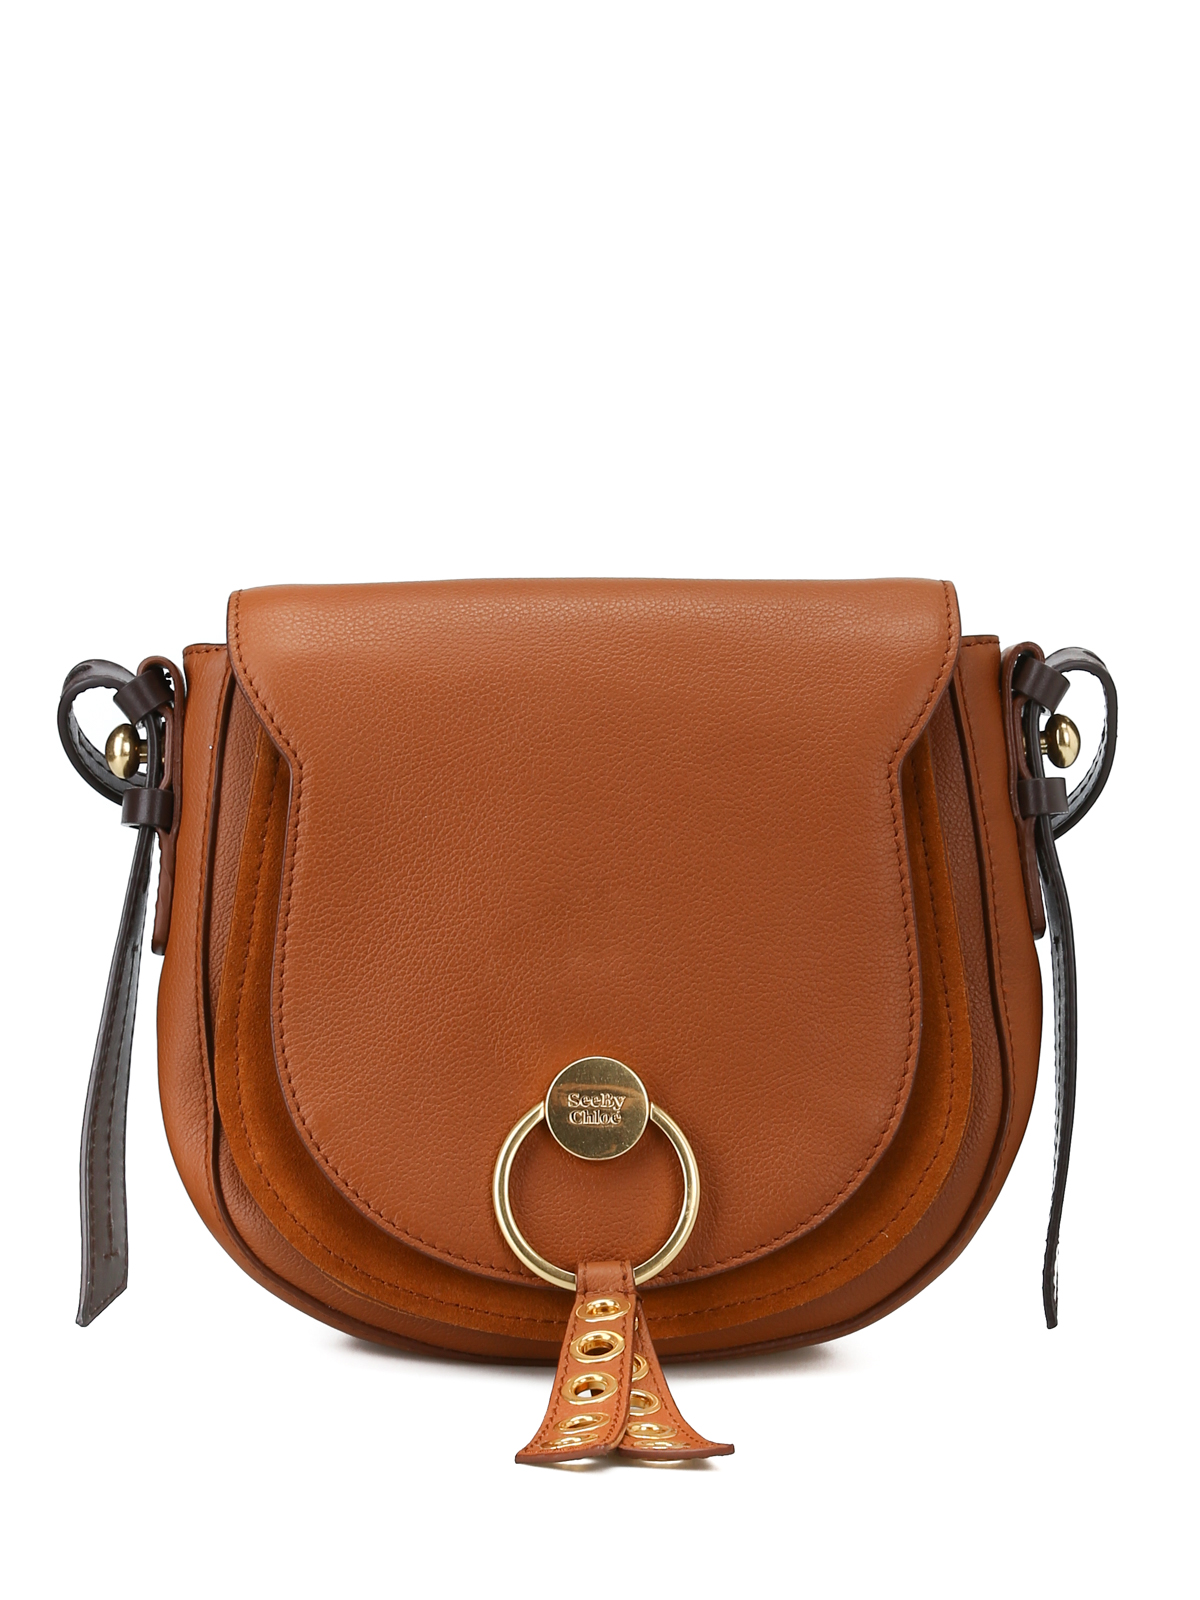 8876a65f20 See by Chloé - Lumir caramel leather medium saddle bag - shoulder ...